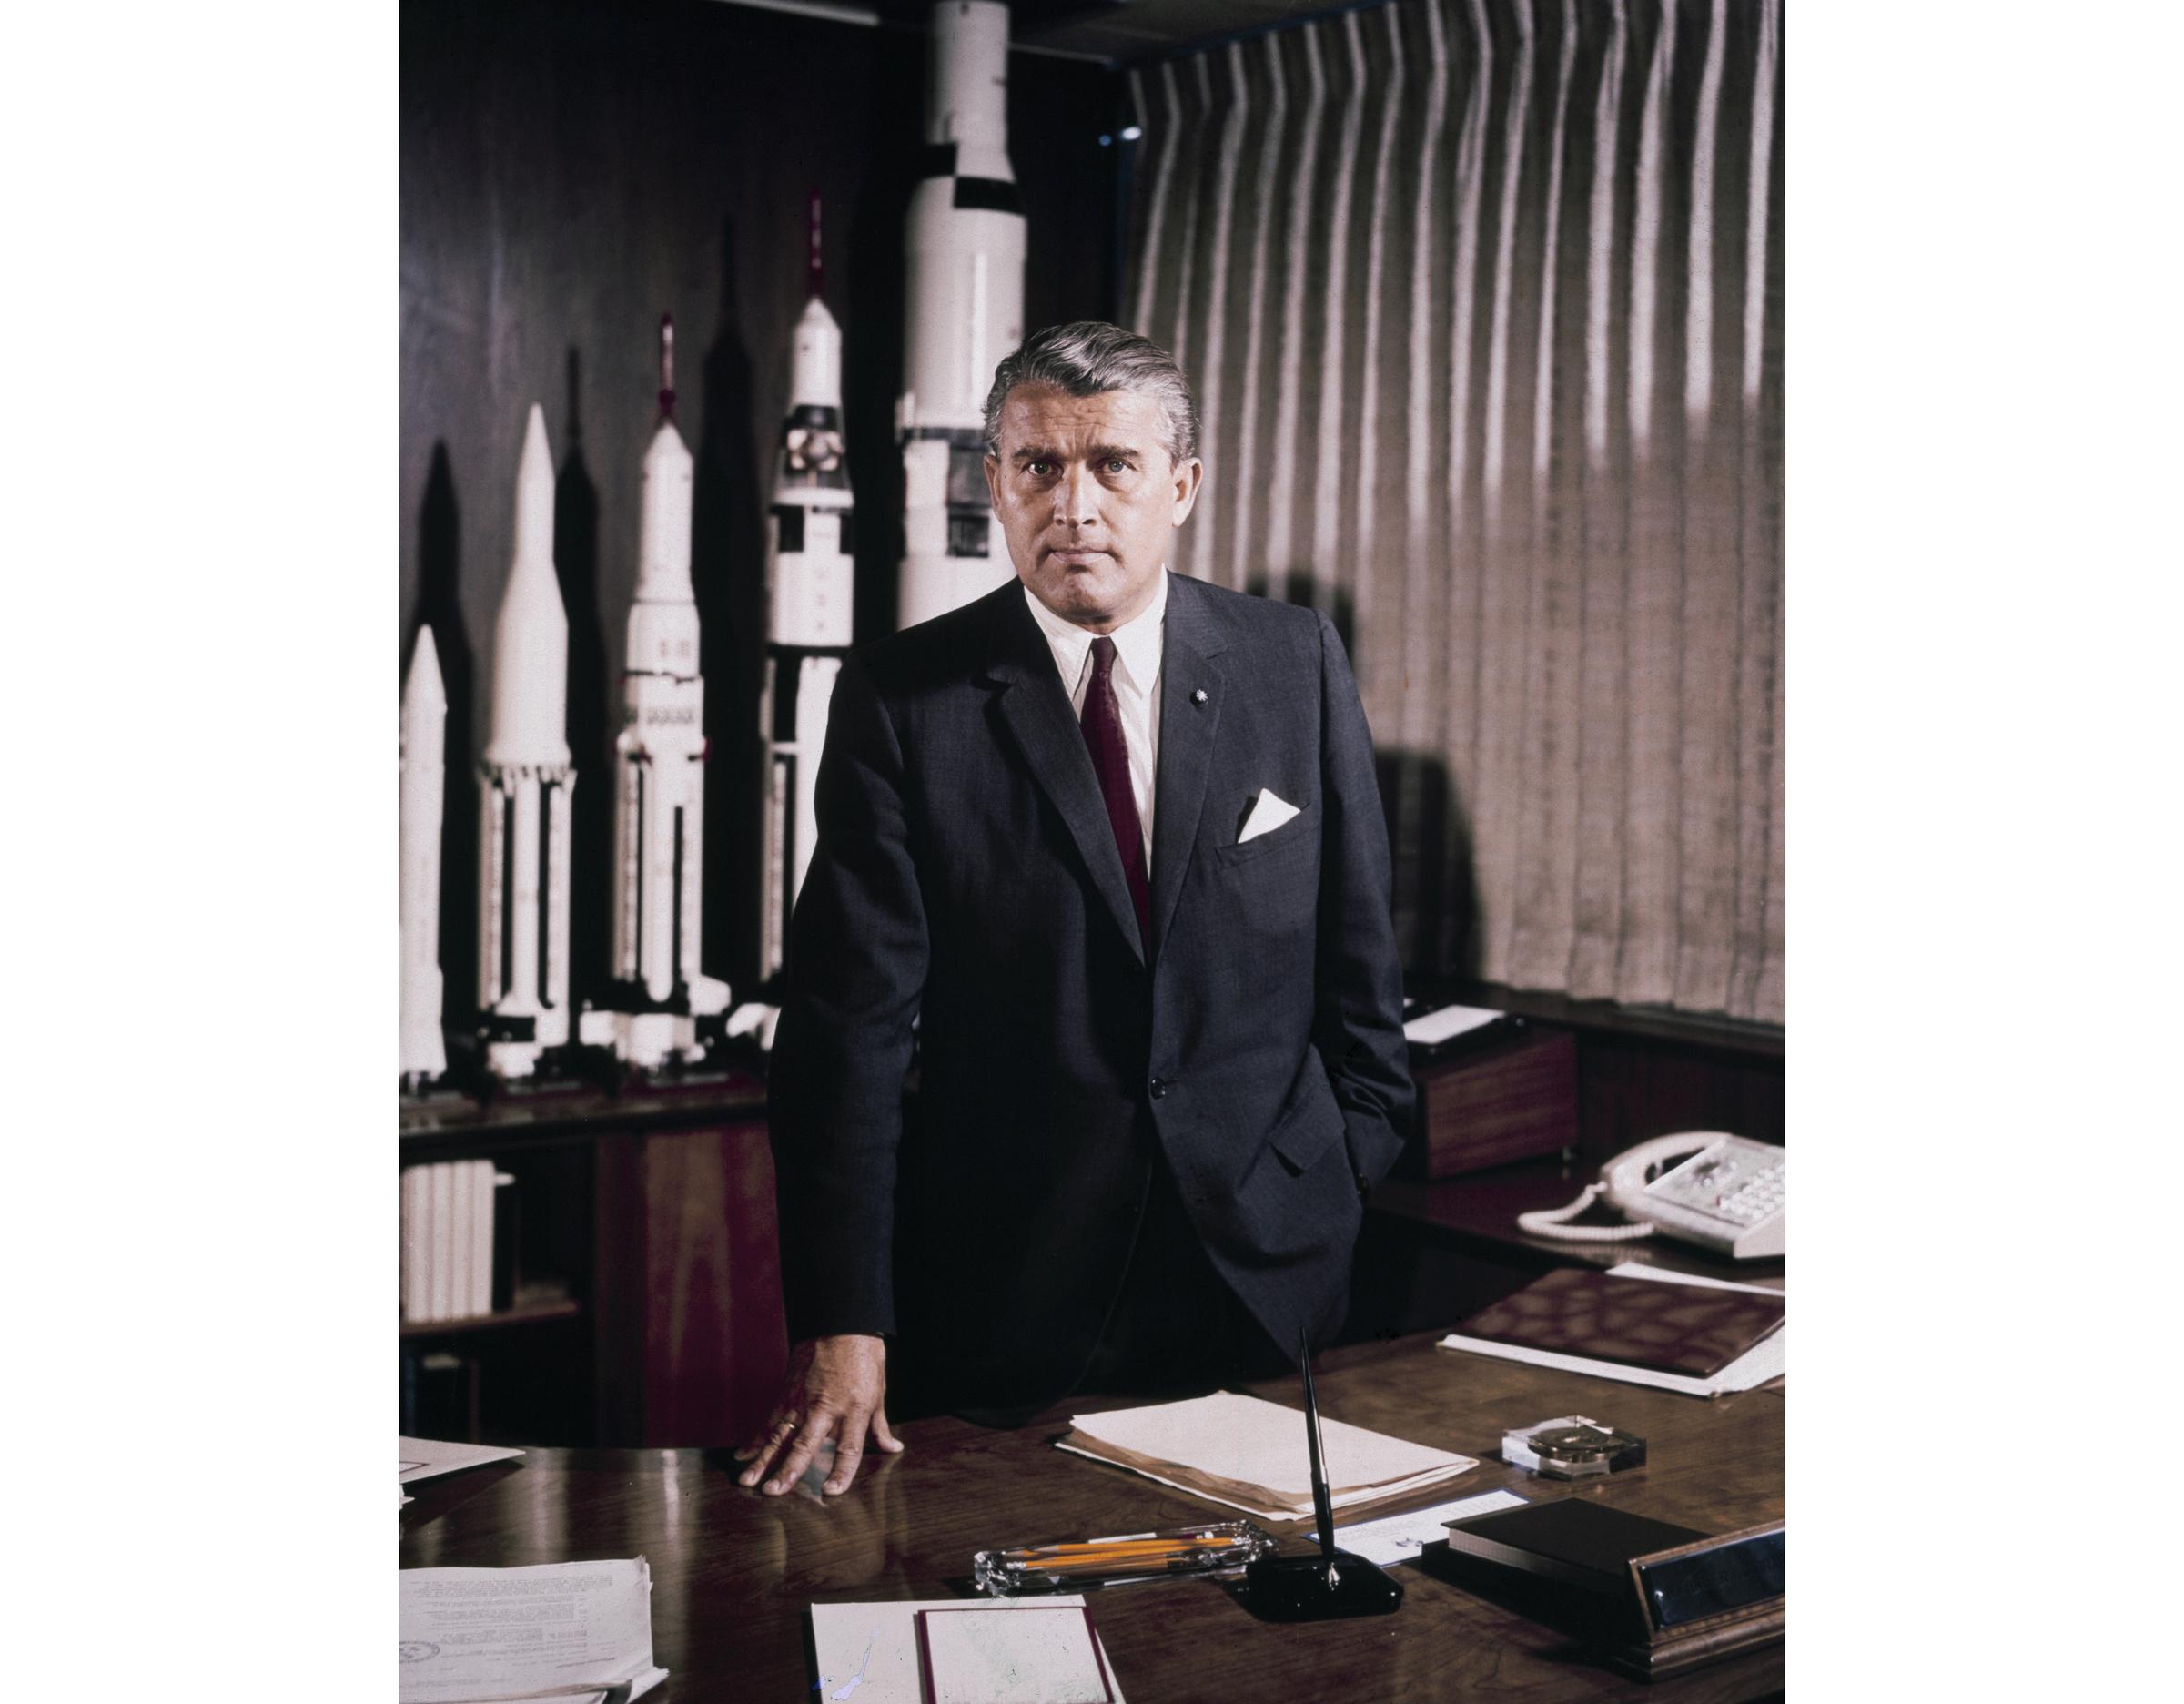 Вернер фон Браун на посту главы Центра космических полётов имени Джорджа Маршалла. Фото © Wikipedia